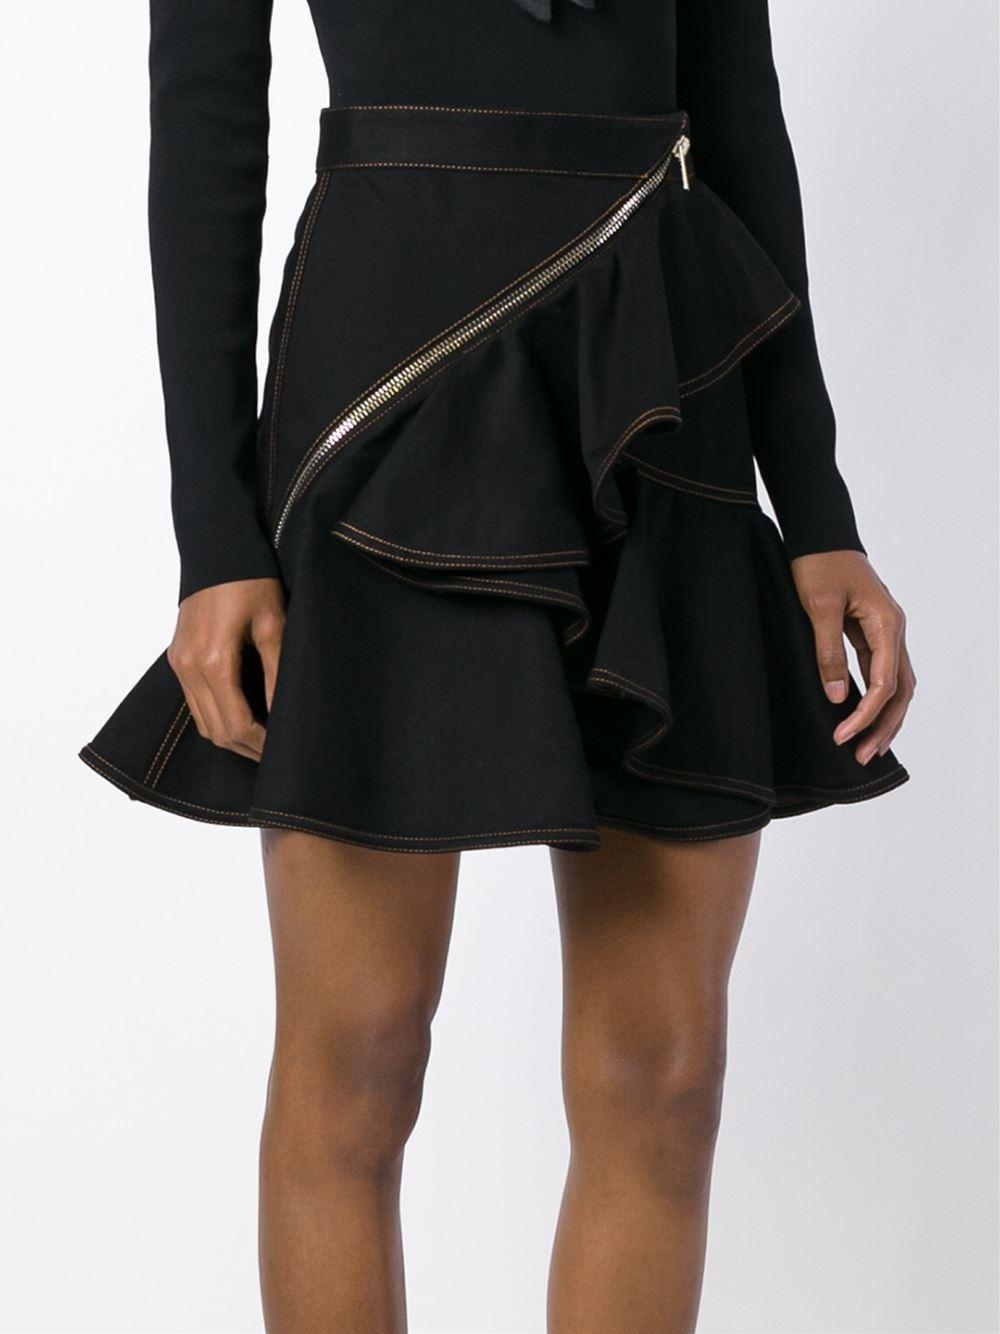 givenchy ruffled denim skirt in black lyst